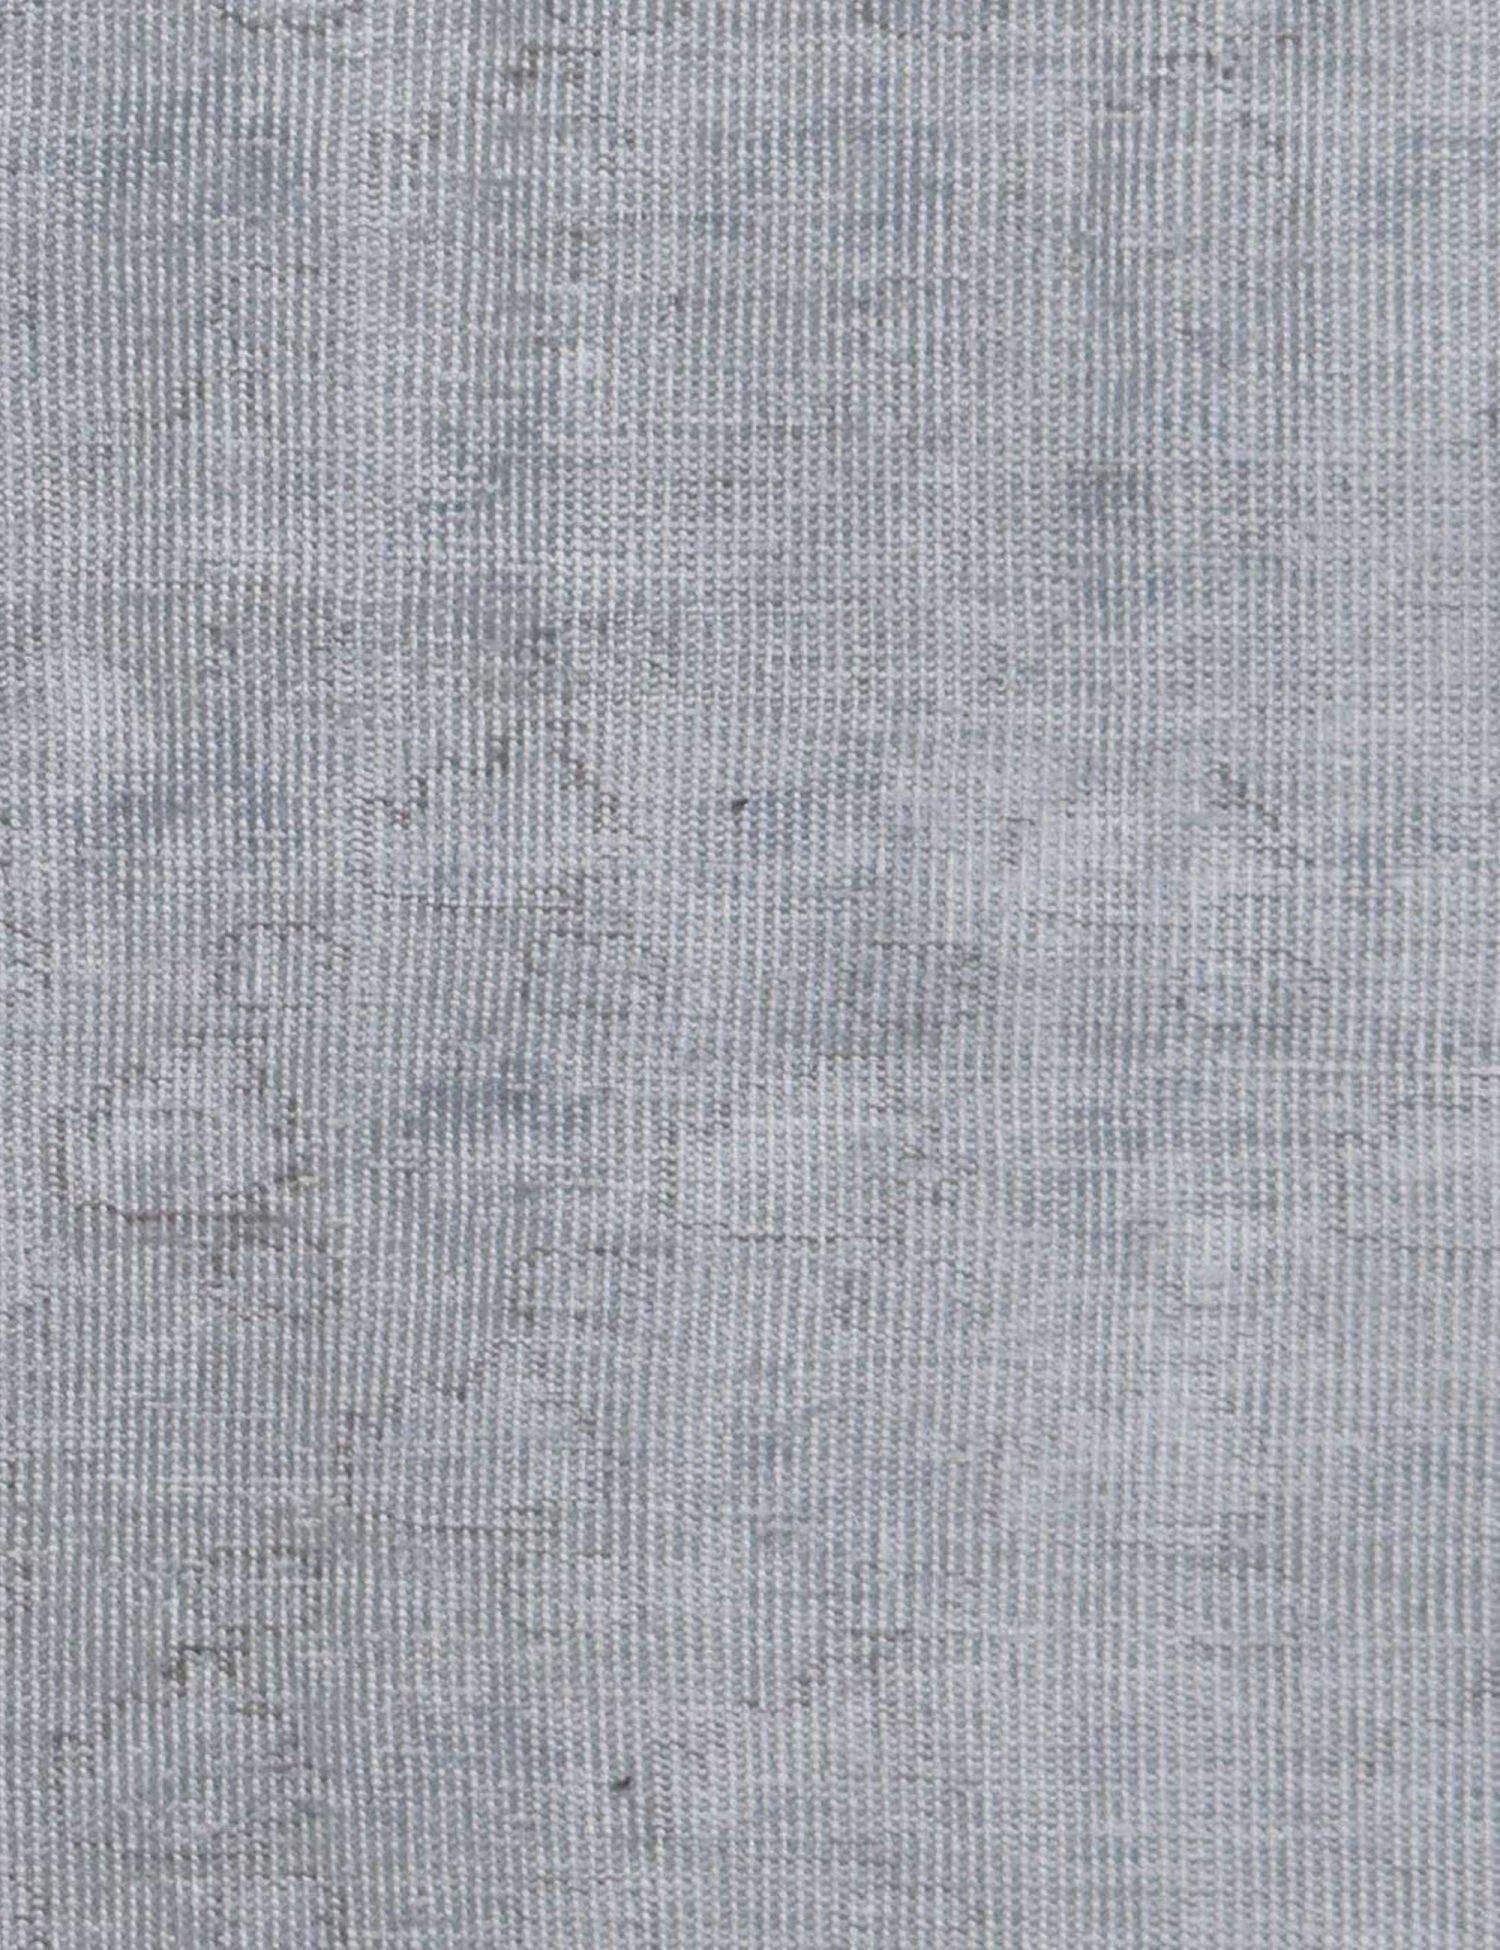 Vintage Perserteppich  grau <br/>138 x 91 cm